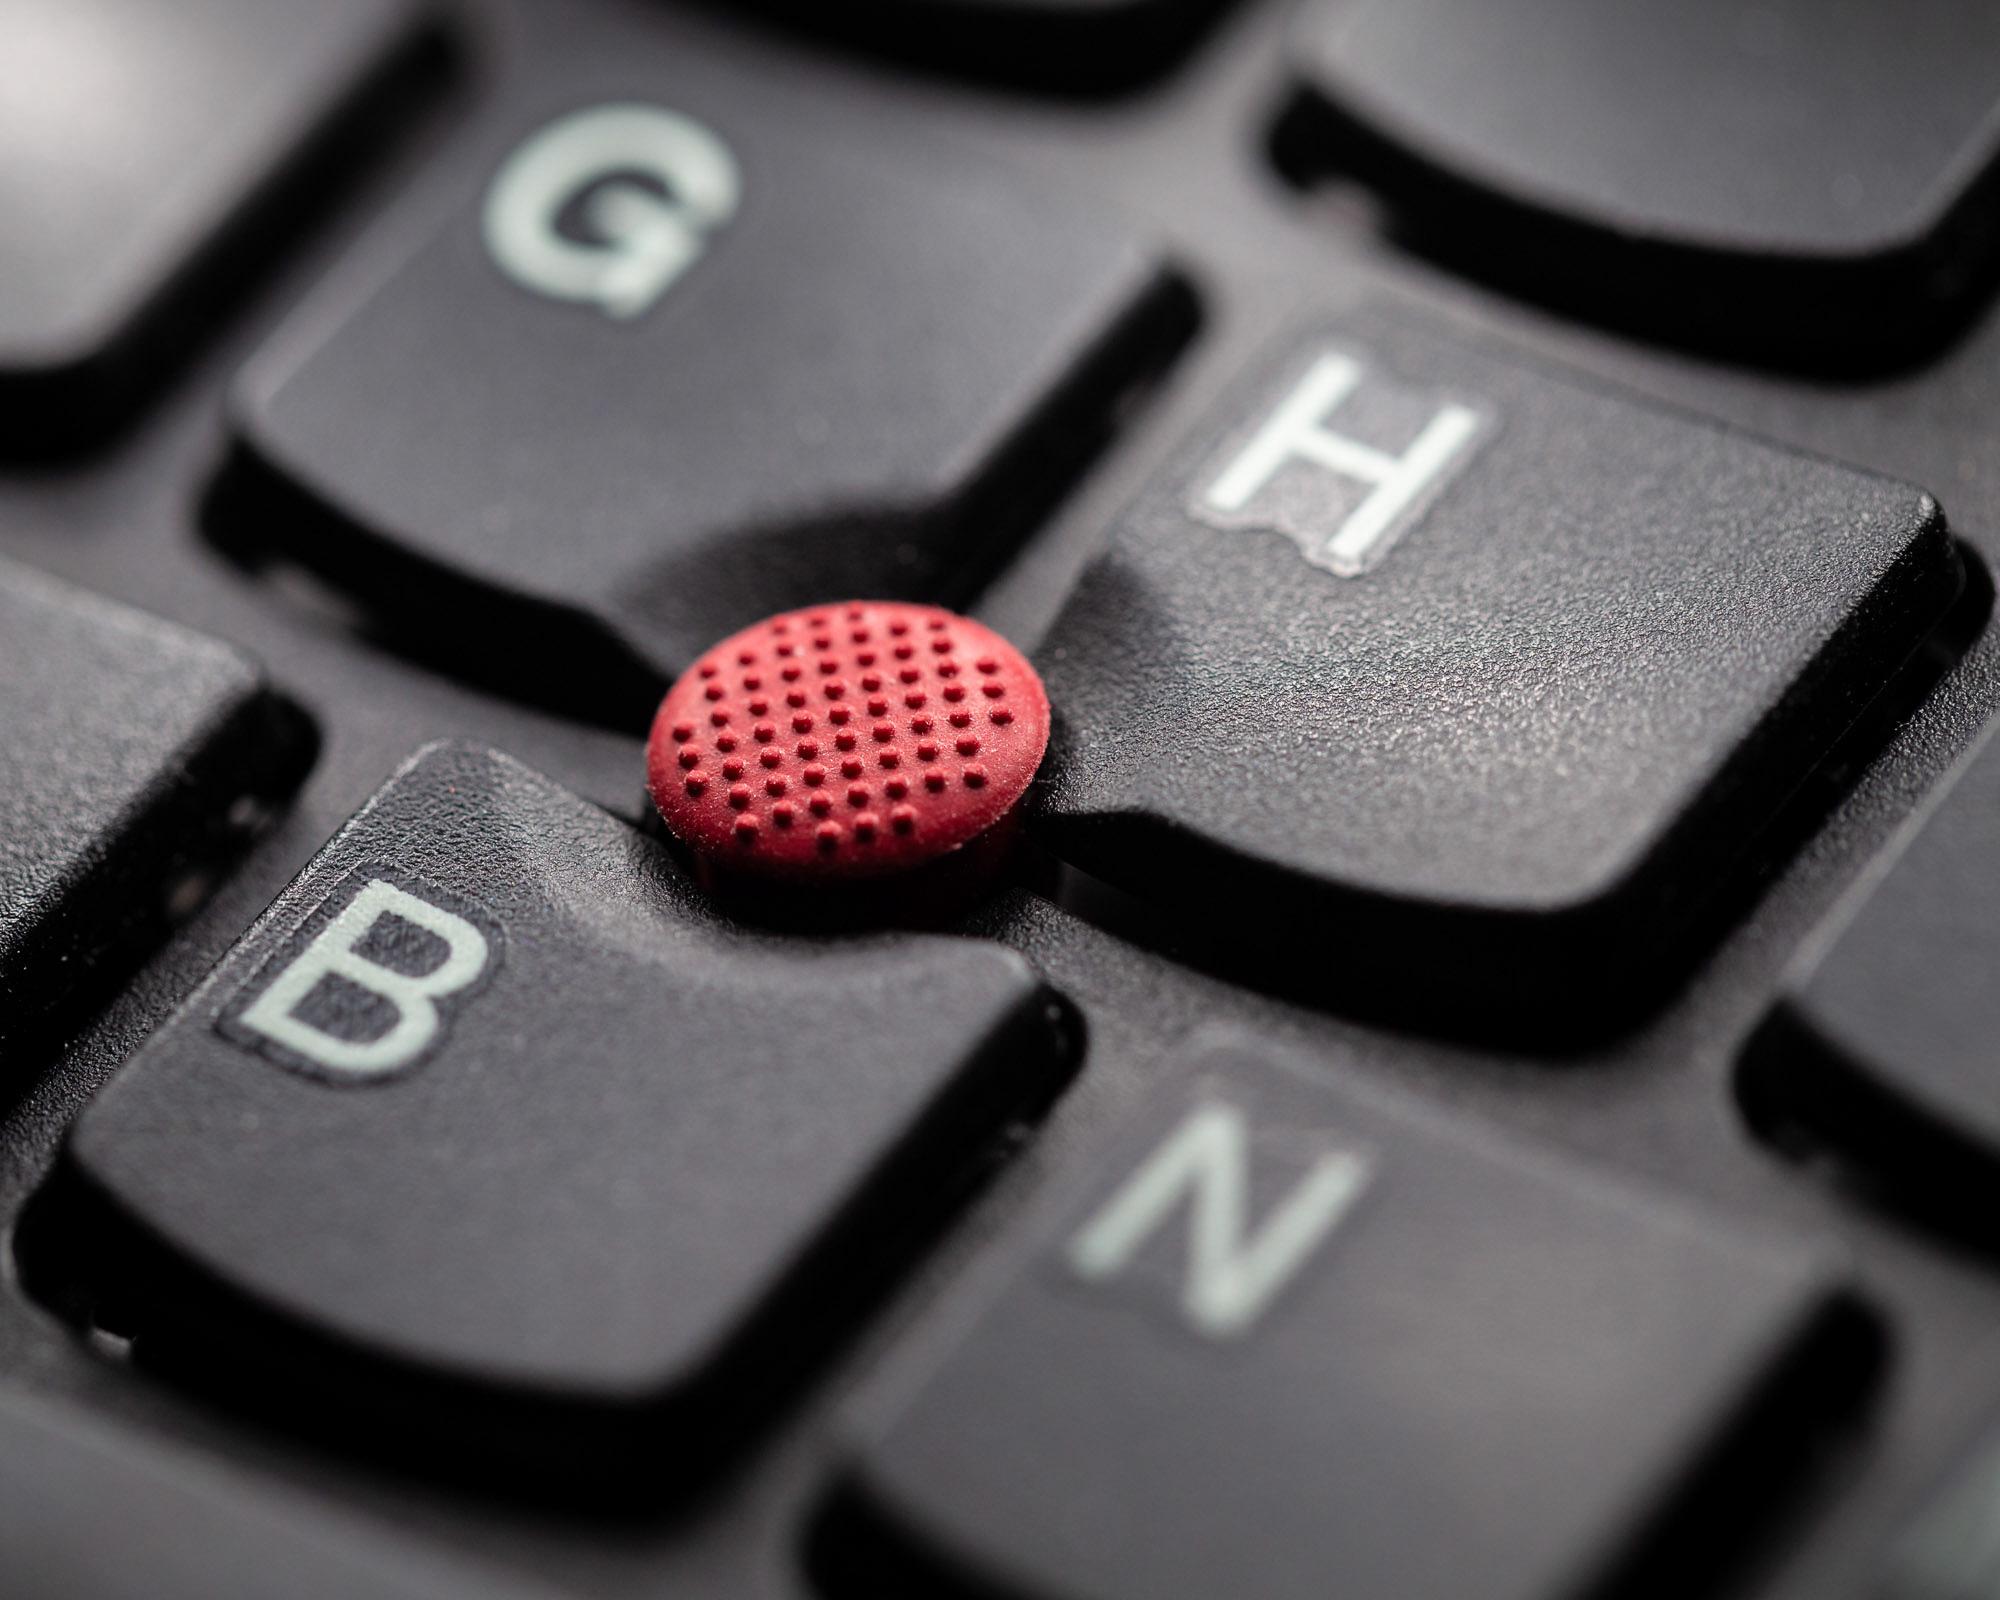 Cthulhusnet / Tastatur Kubbel